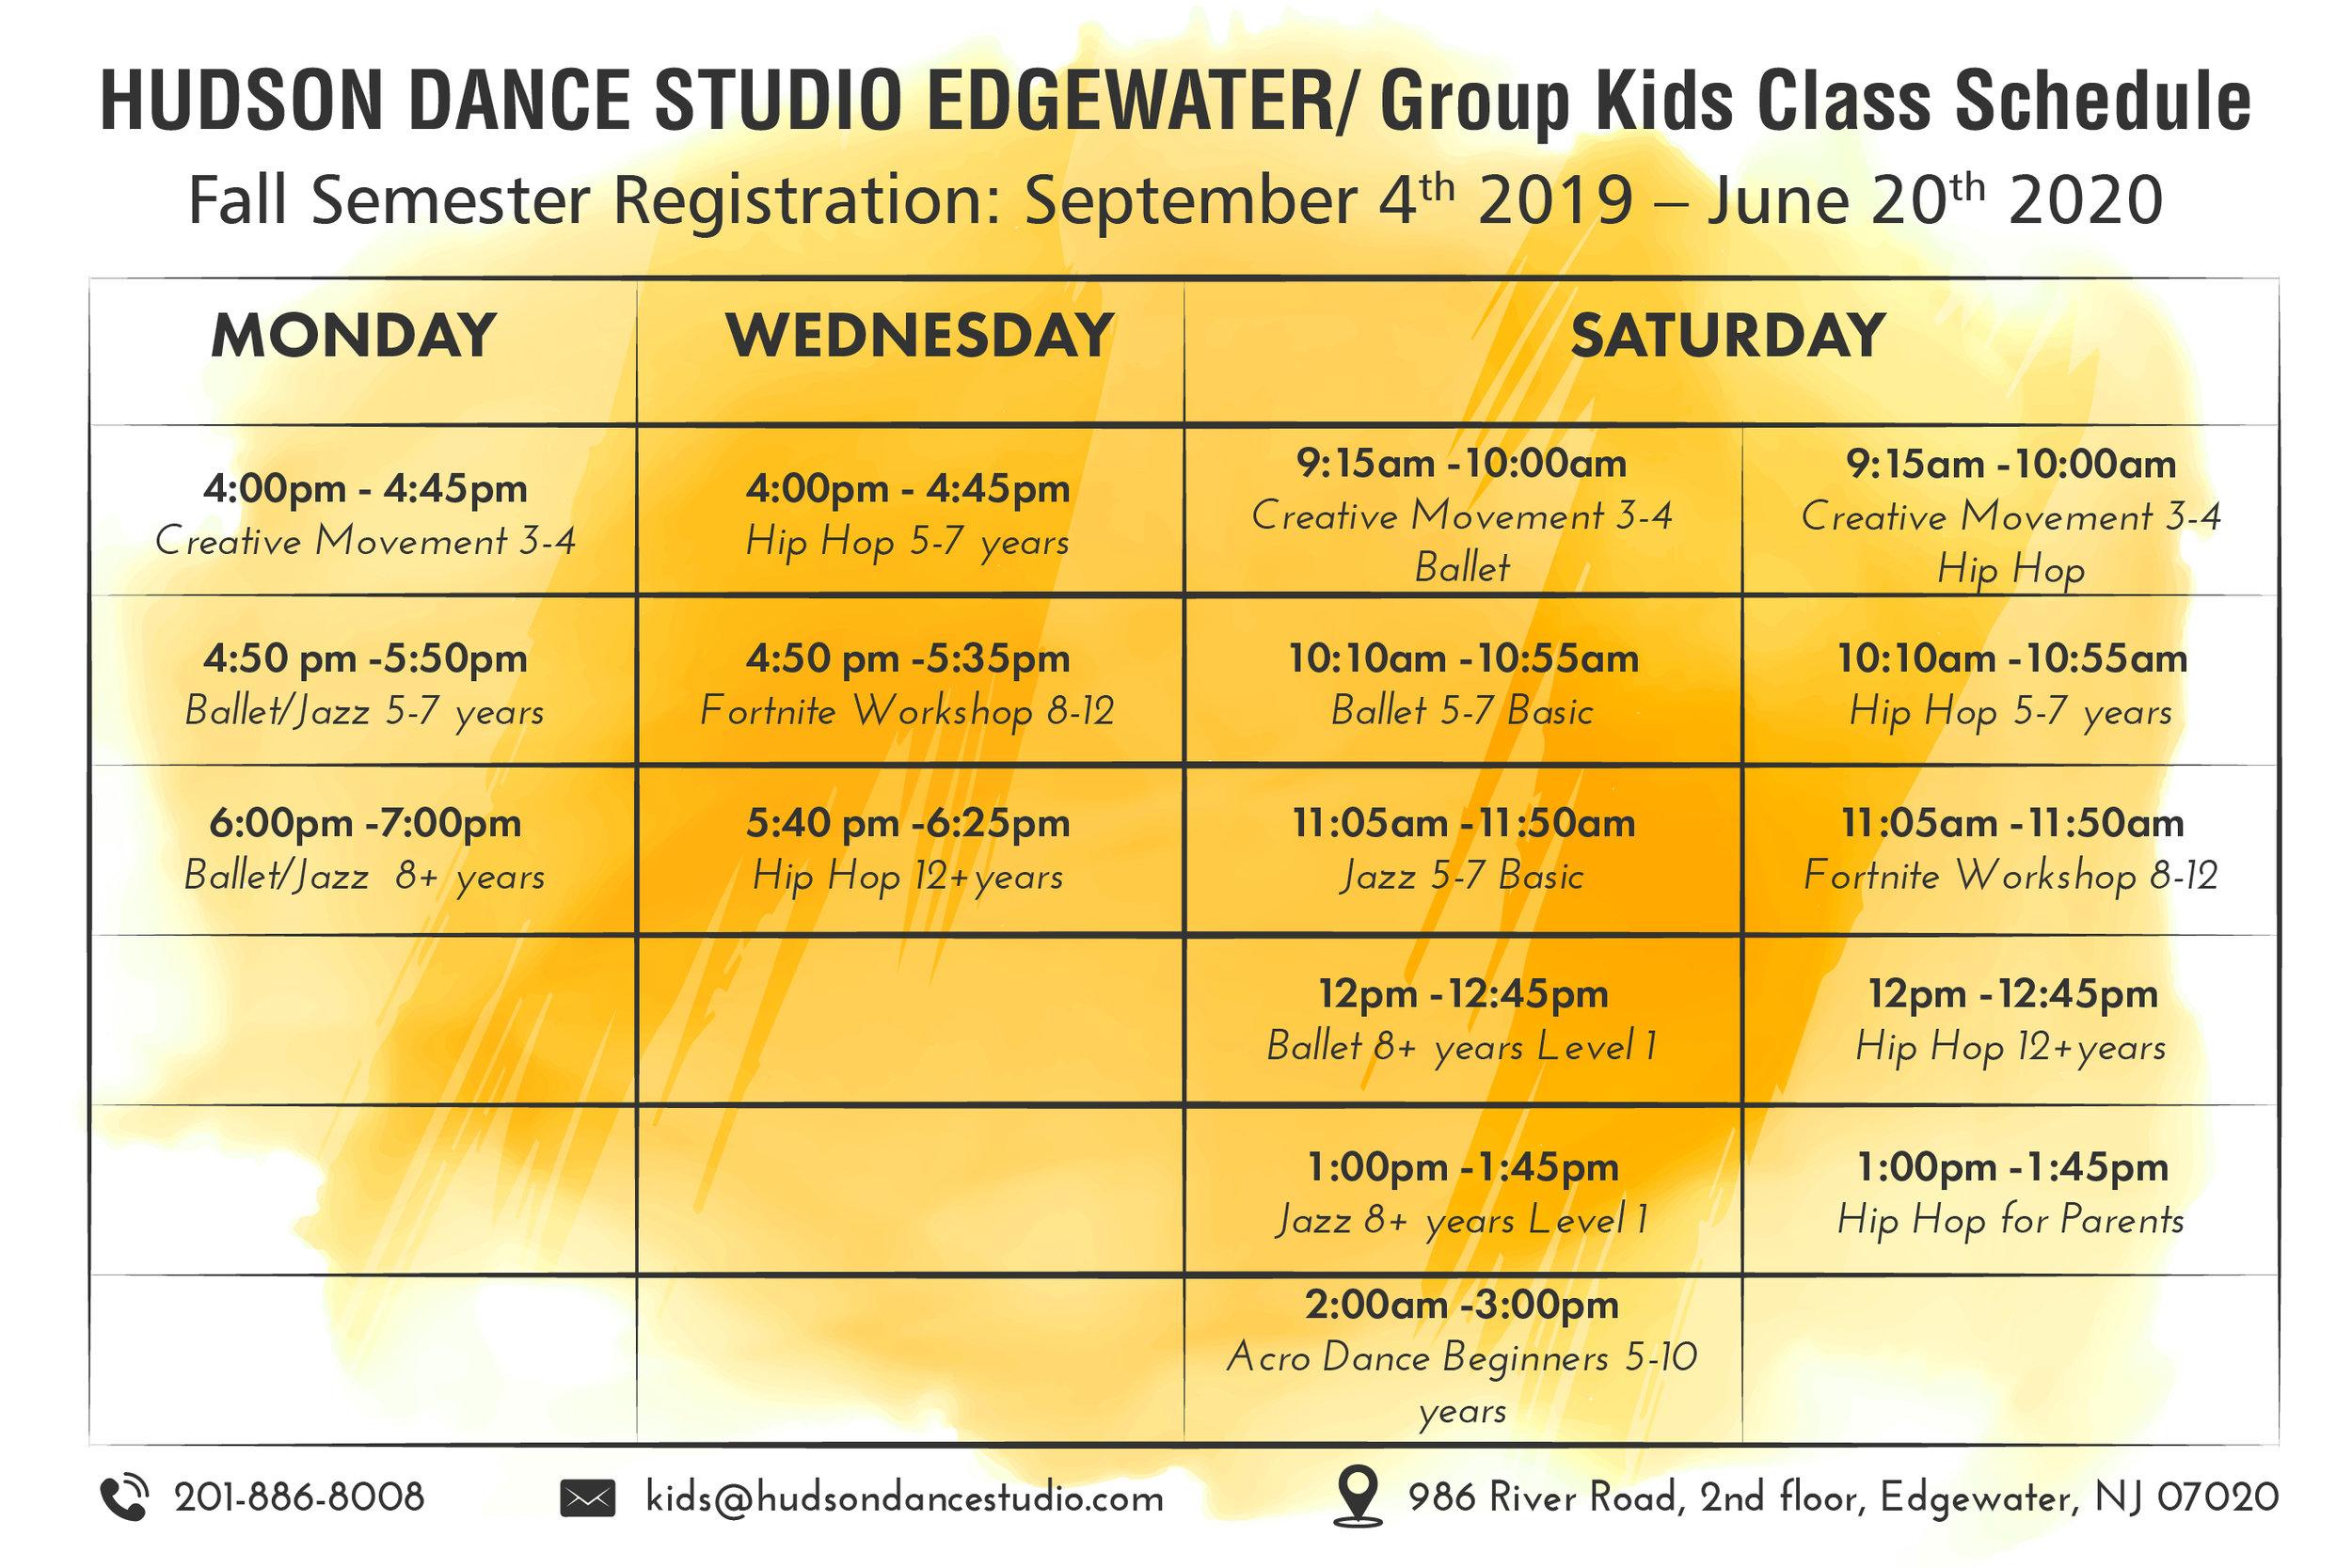 Kids Dance Schedule Edgewater NJ.jpg